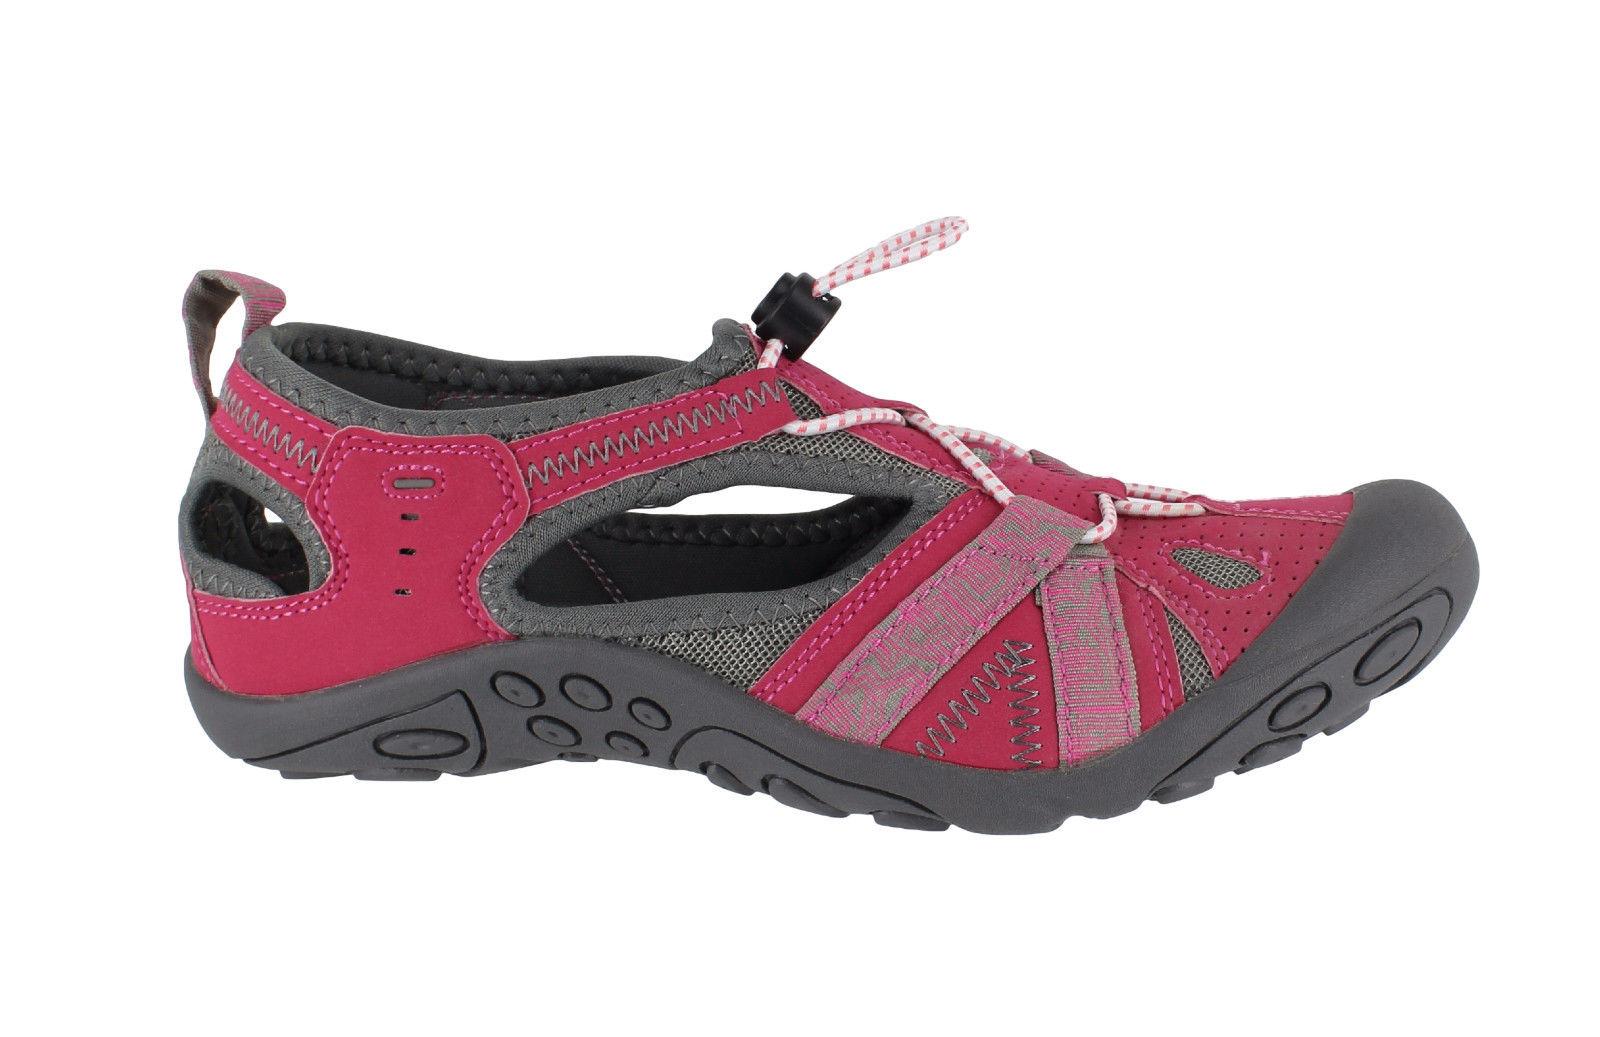 Womens Lightweight Adventure Walking Trail Sports Sandals